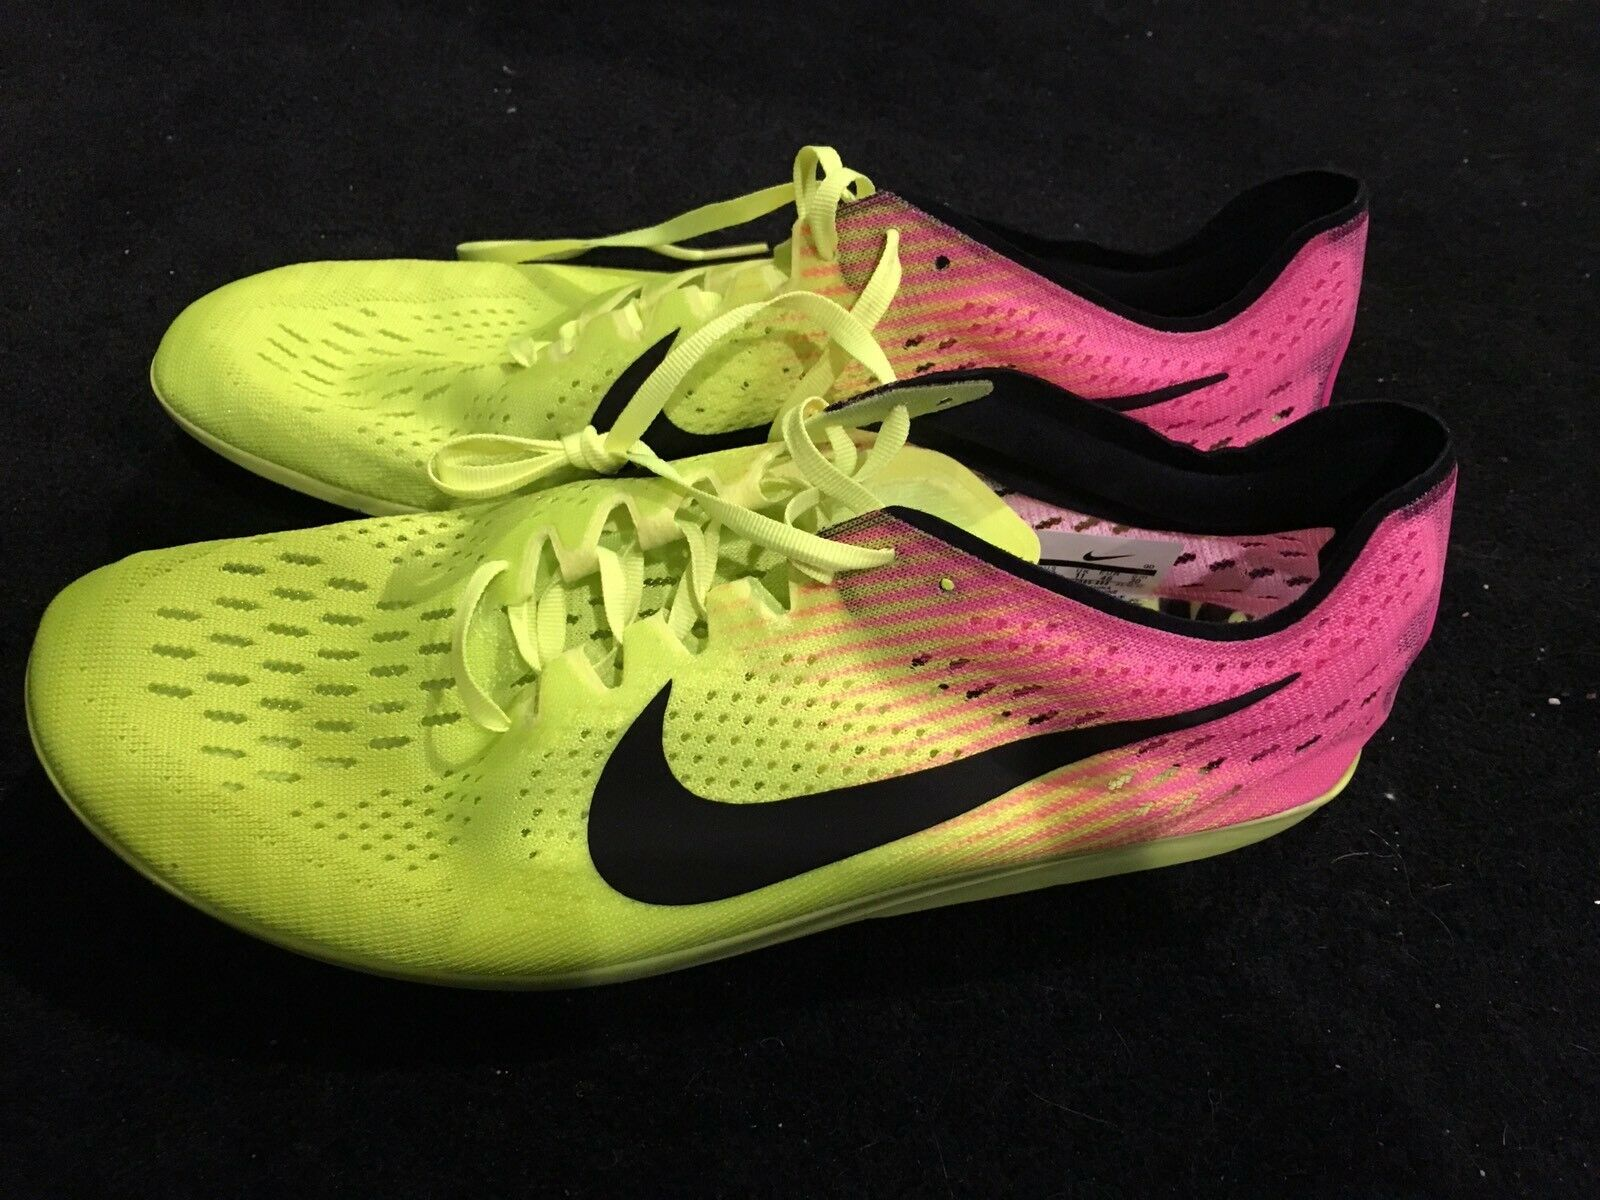 Nike zoom matumbo rio o scarpe da corsa, s835995-999 Uomo sz 12 nnb 125